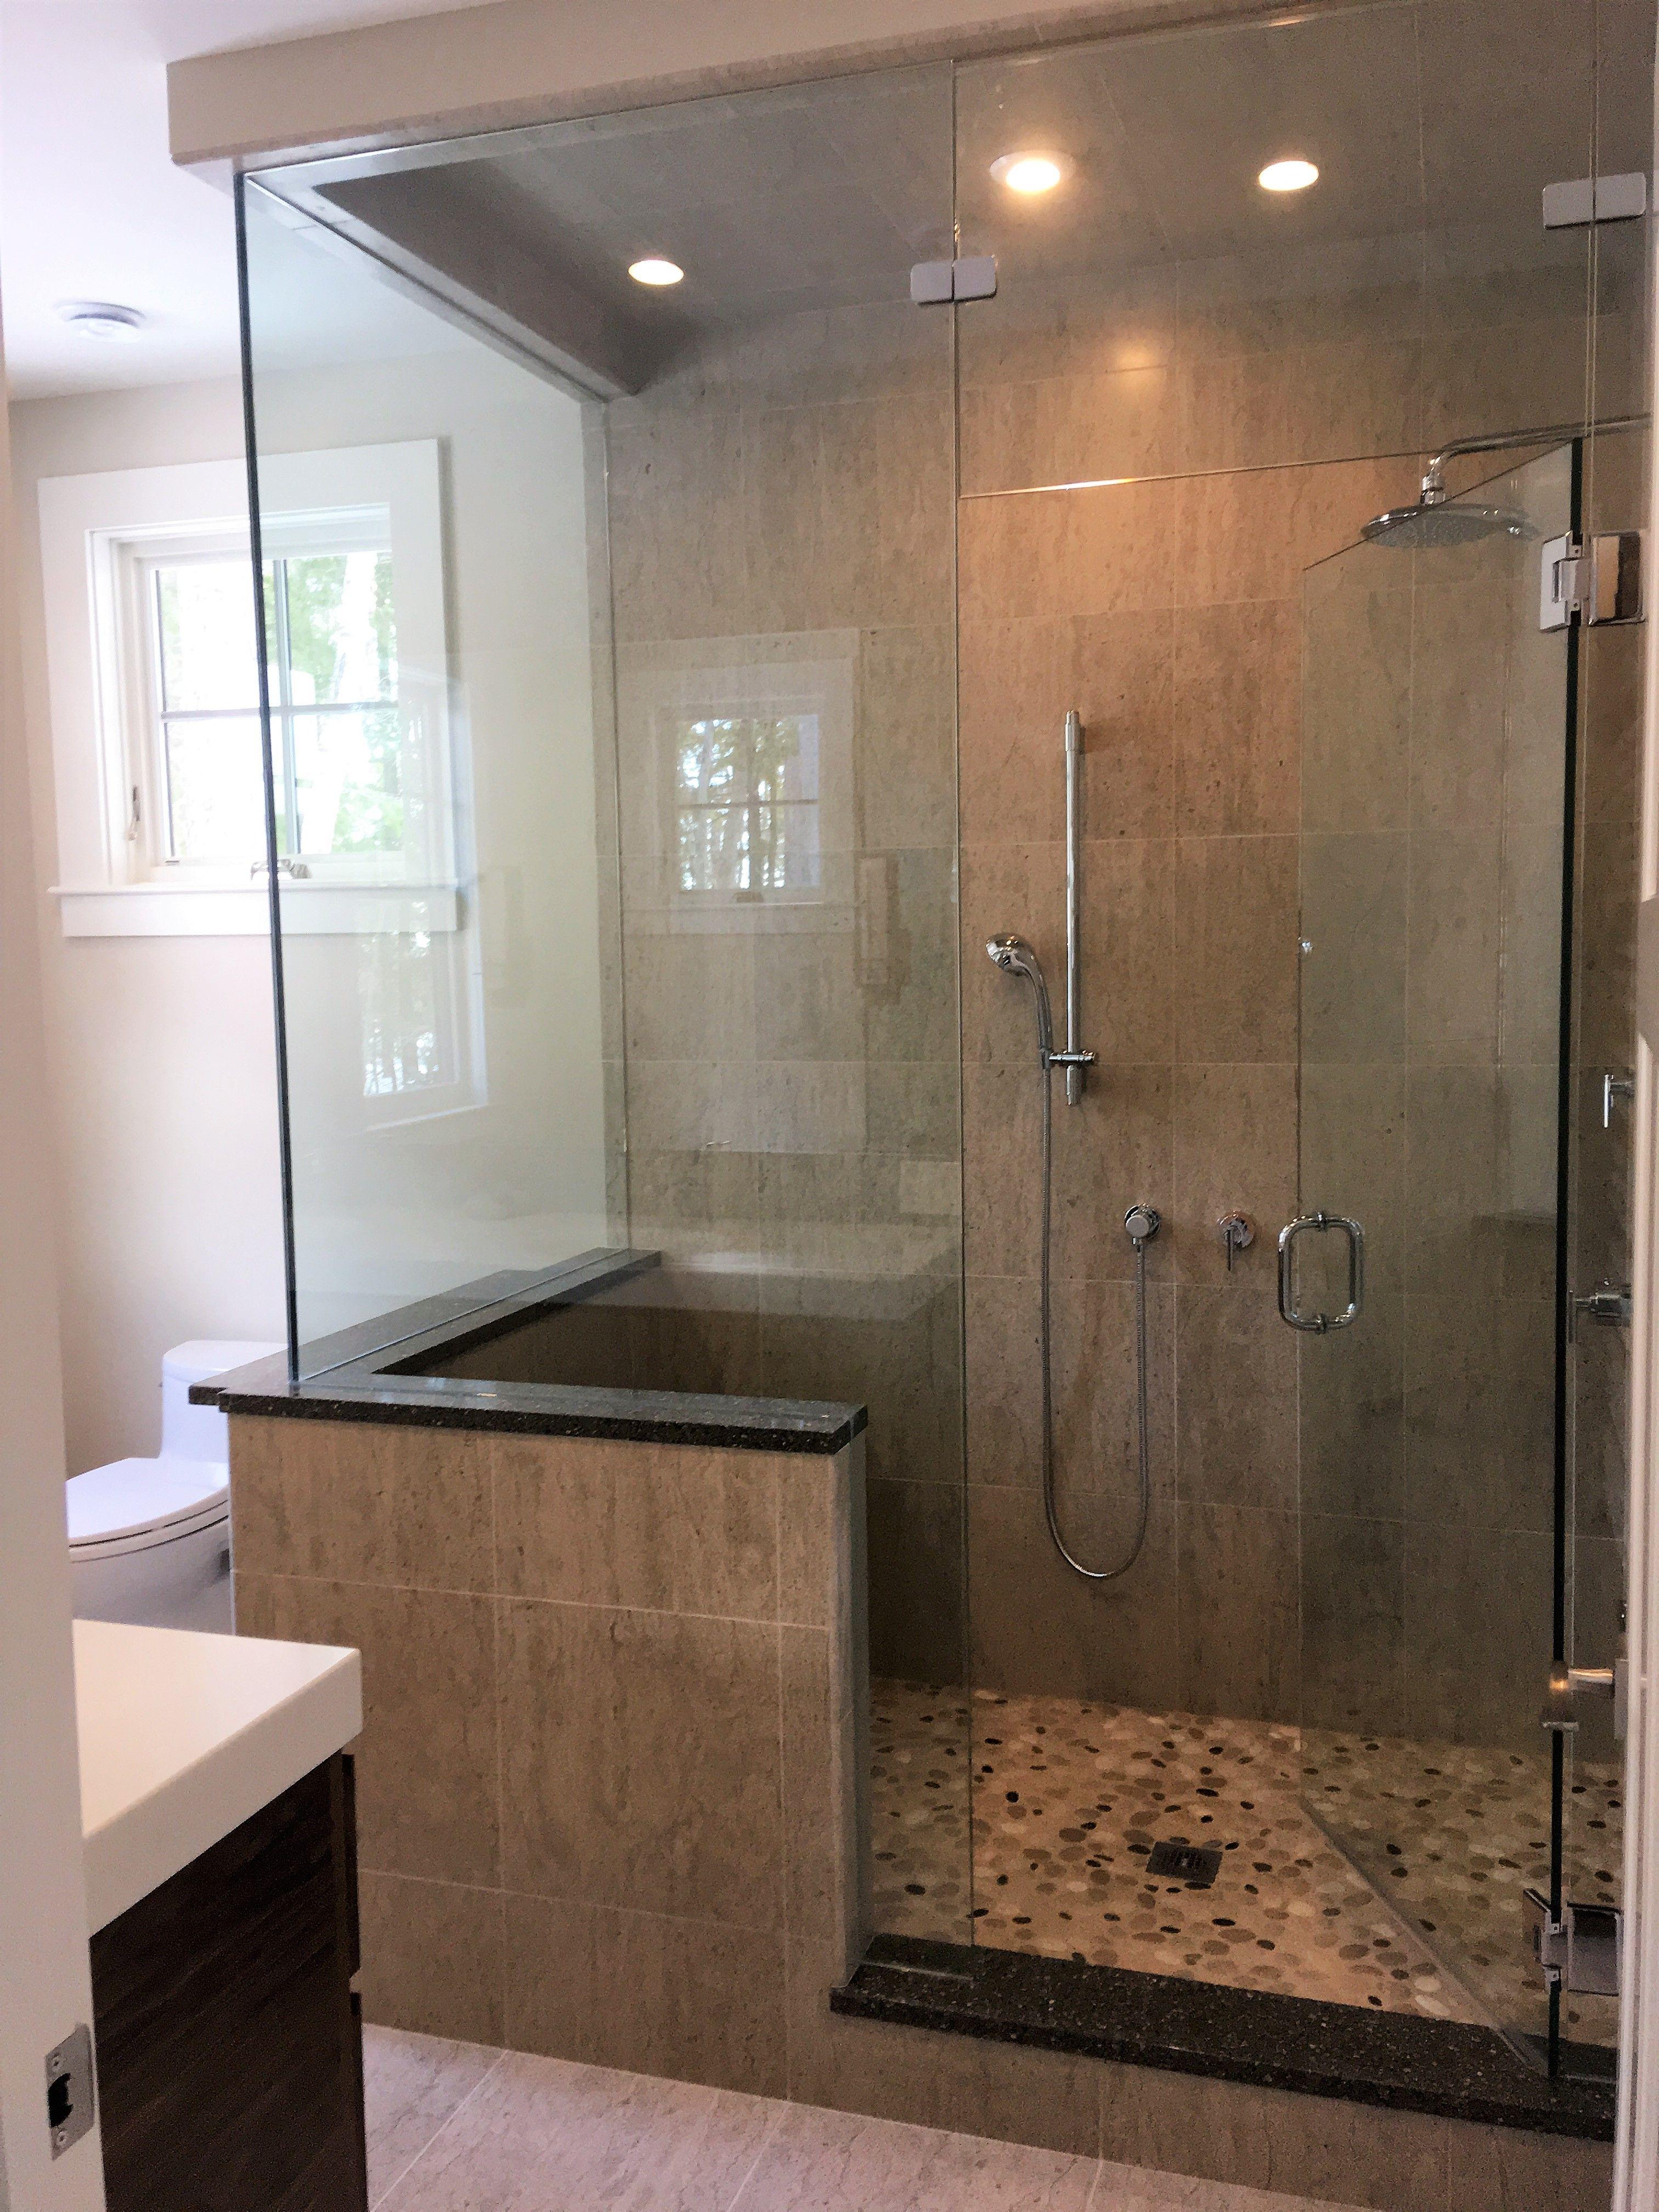 Steam shower with pebble floor   Bathroom   Pinterest   Steam showers